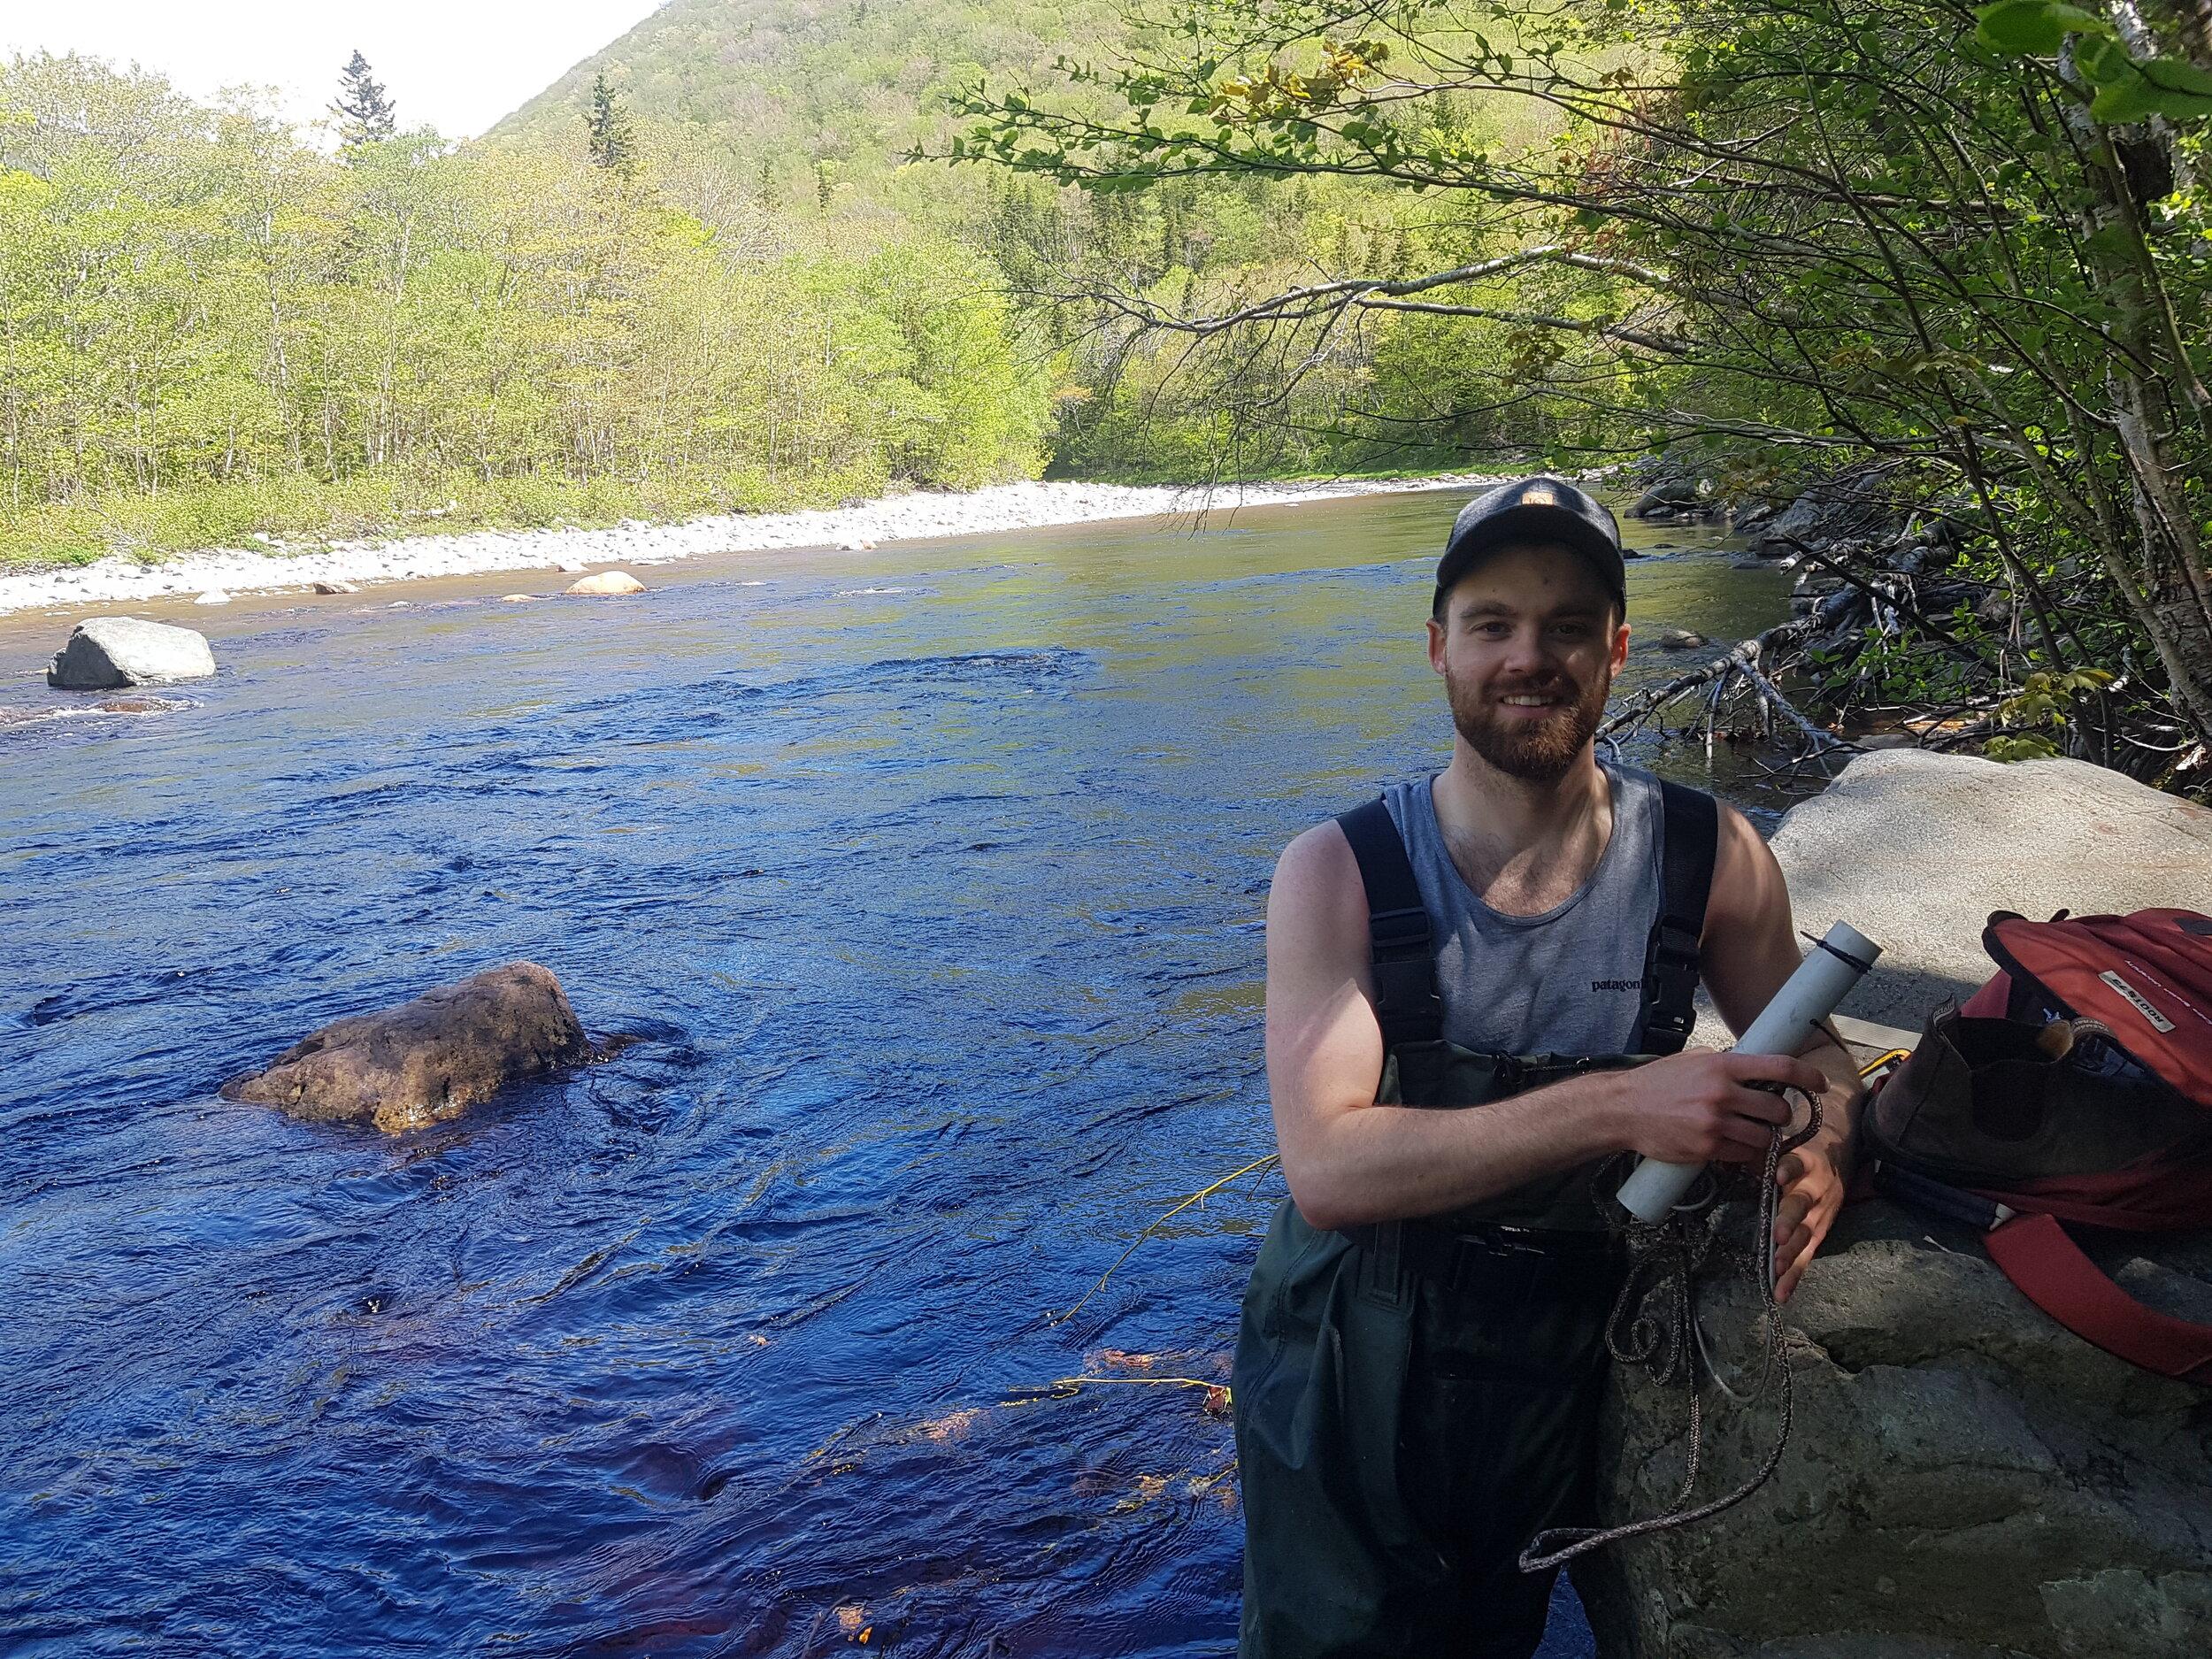 Matt Fraser, CRSA's Habitat Restoration Crew Leader this summer, helped install water temperature loggers on the Cheticamp River